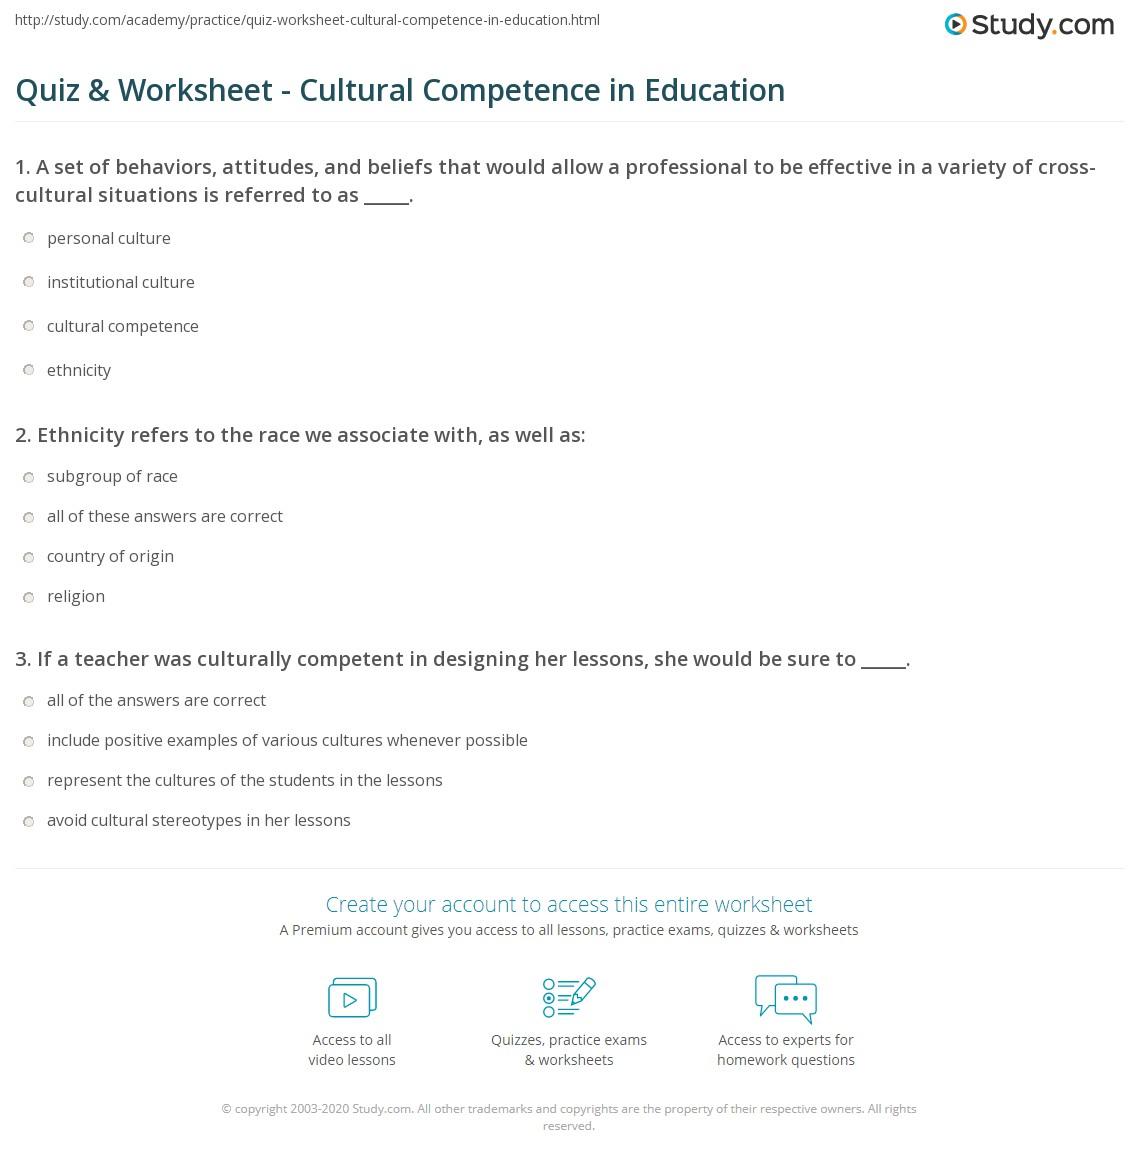 quiz worksheet cultural competence in education. Black Bedroom Furniture Sets. Home Design Ideas